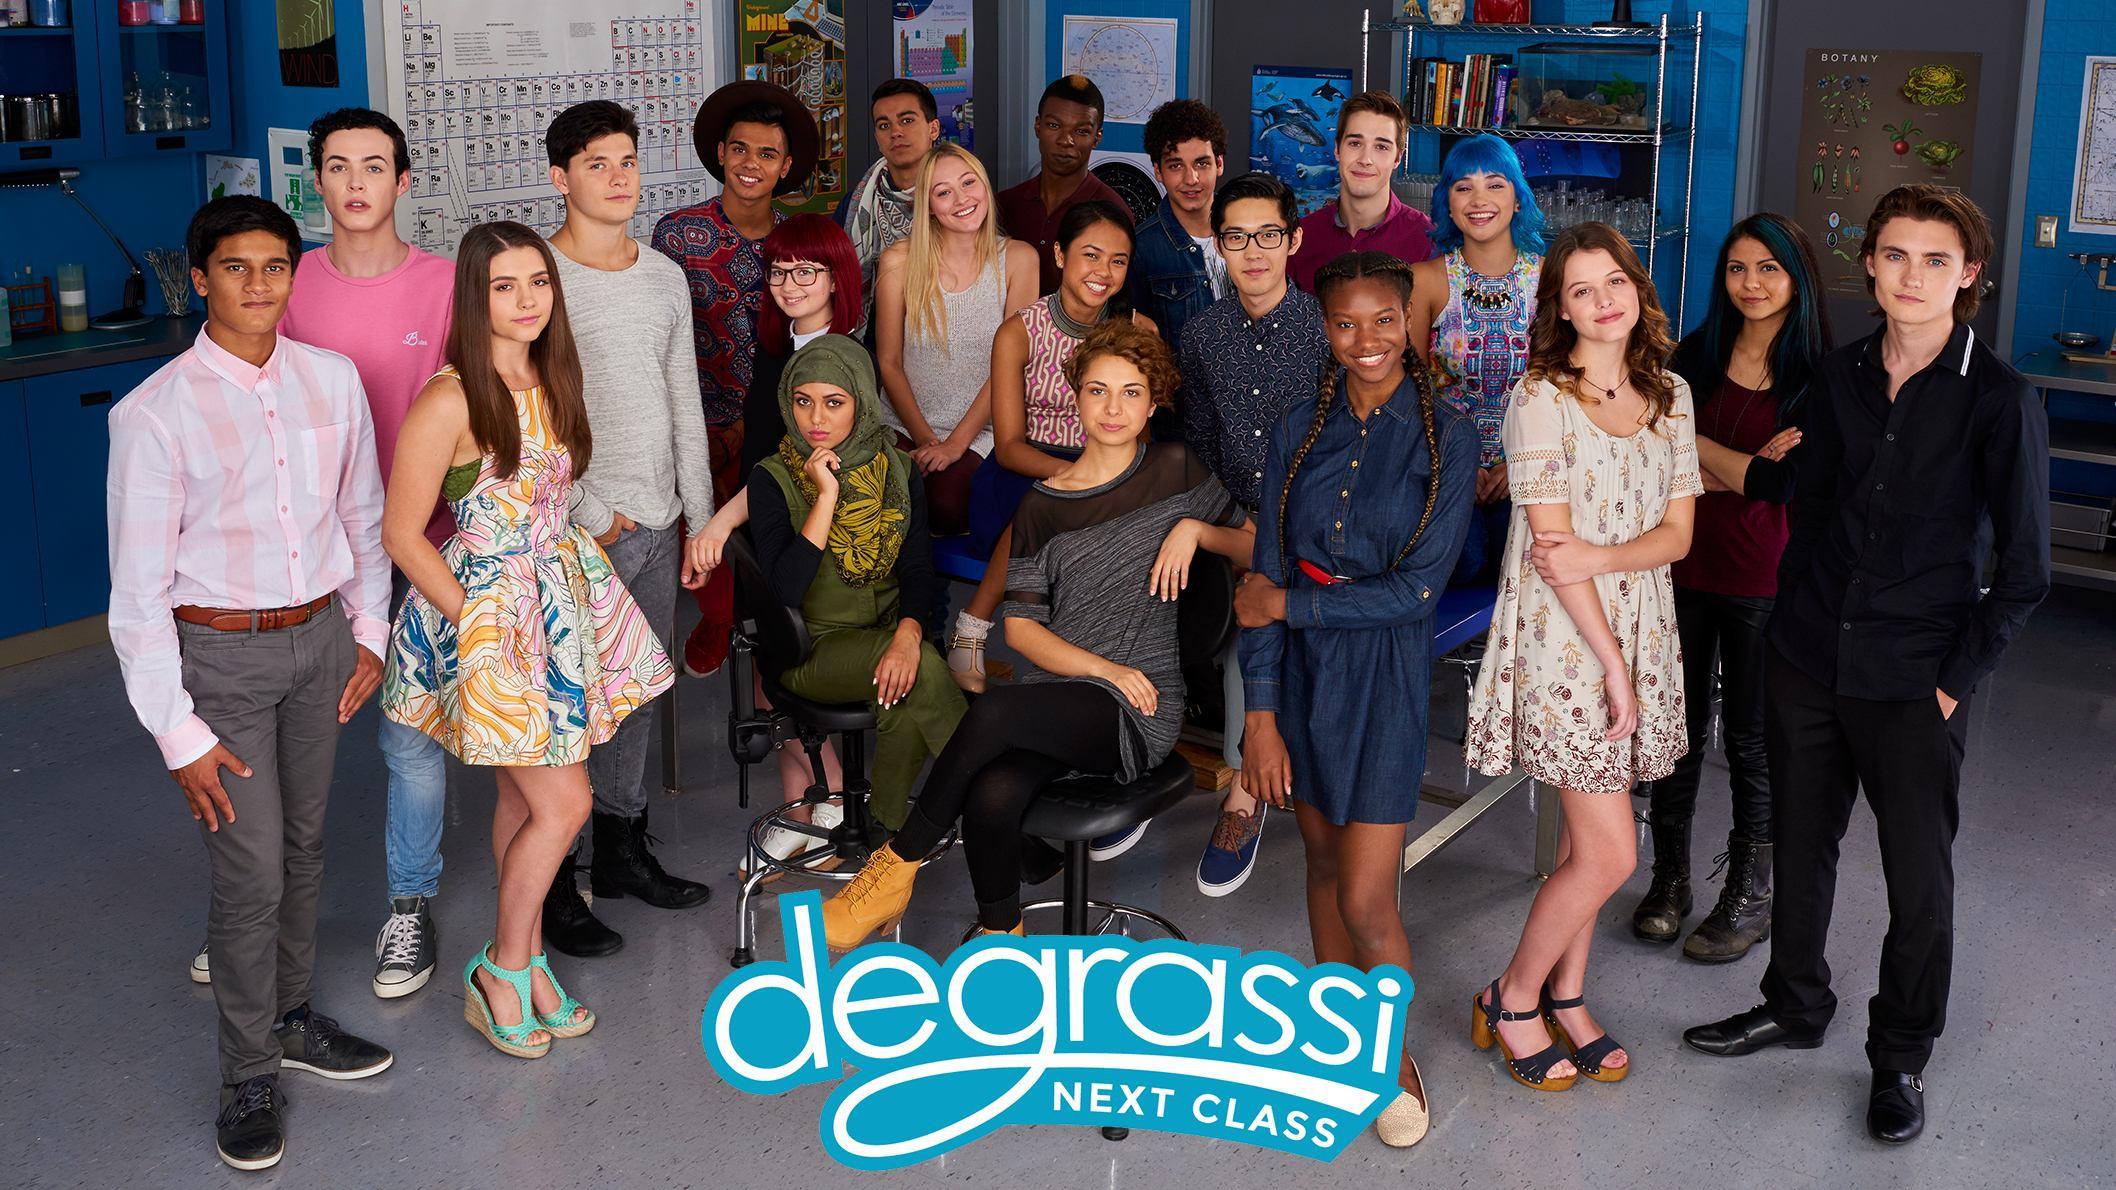 Degrassi: Next Class' is the Netflix Original You Should Be Binging